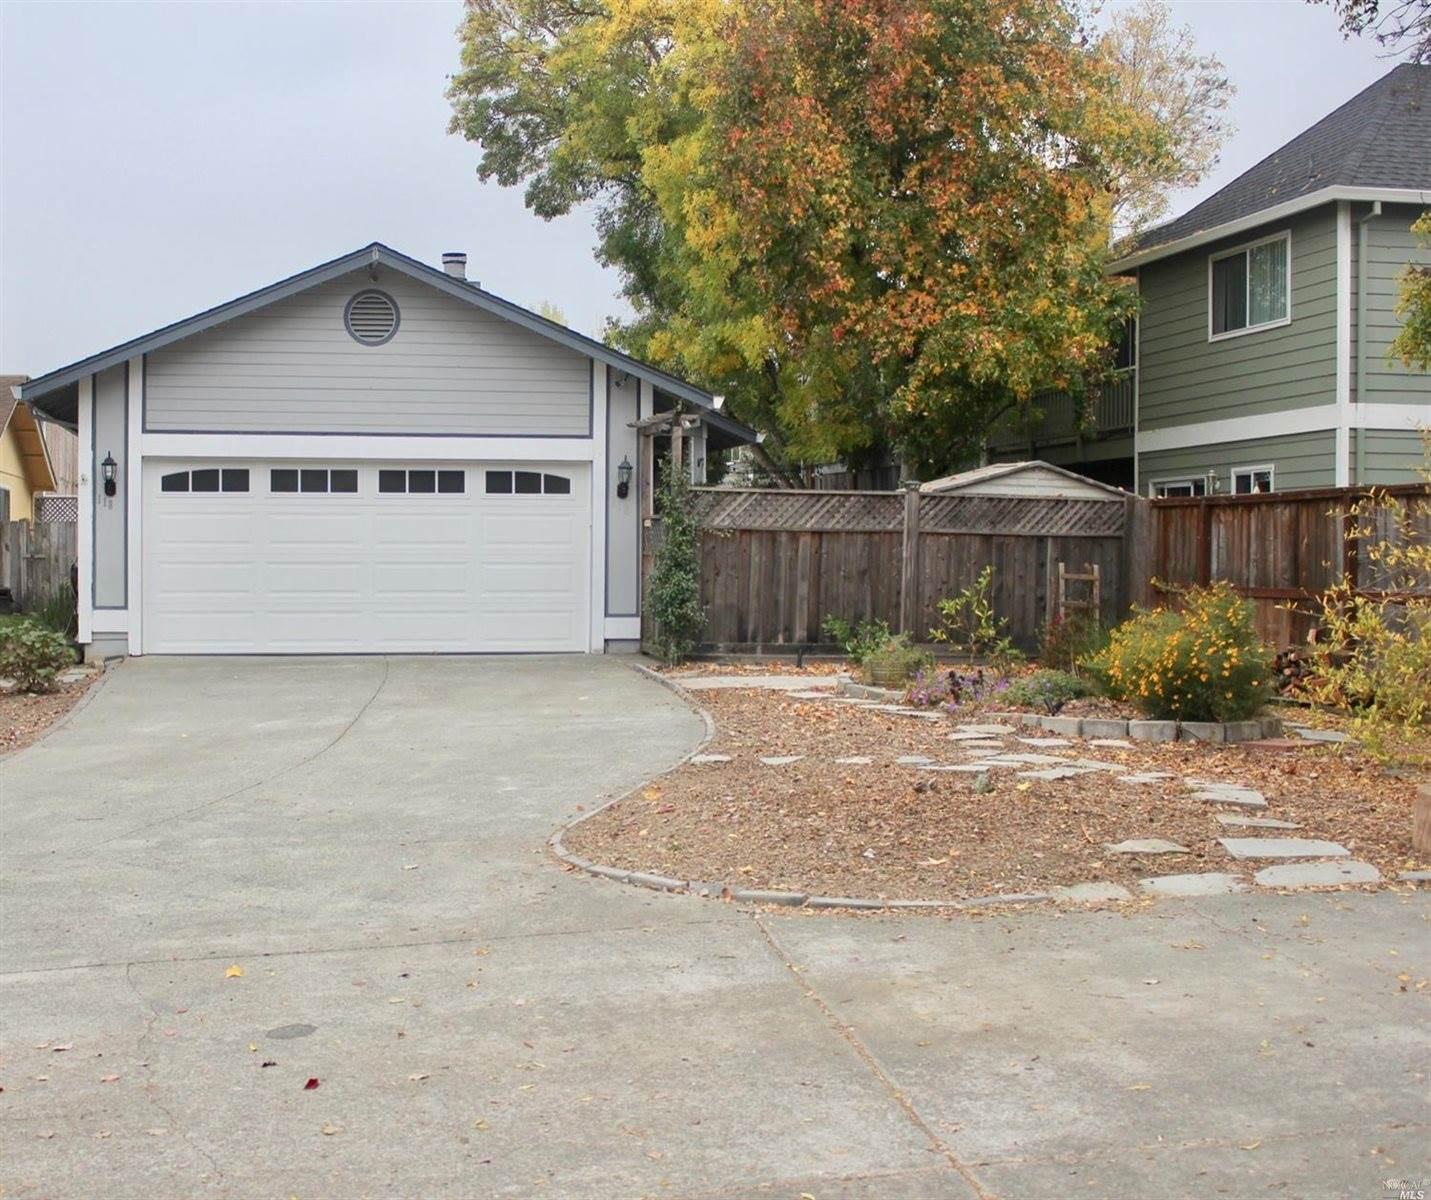 118 Pinewood Court, Cotati, CA 94931